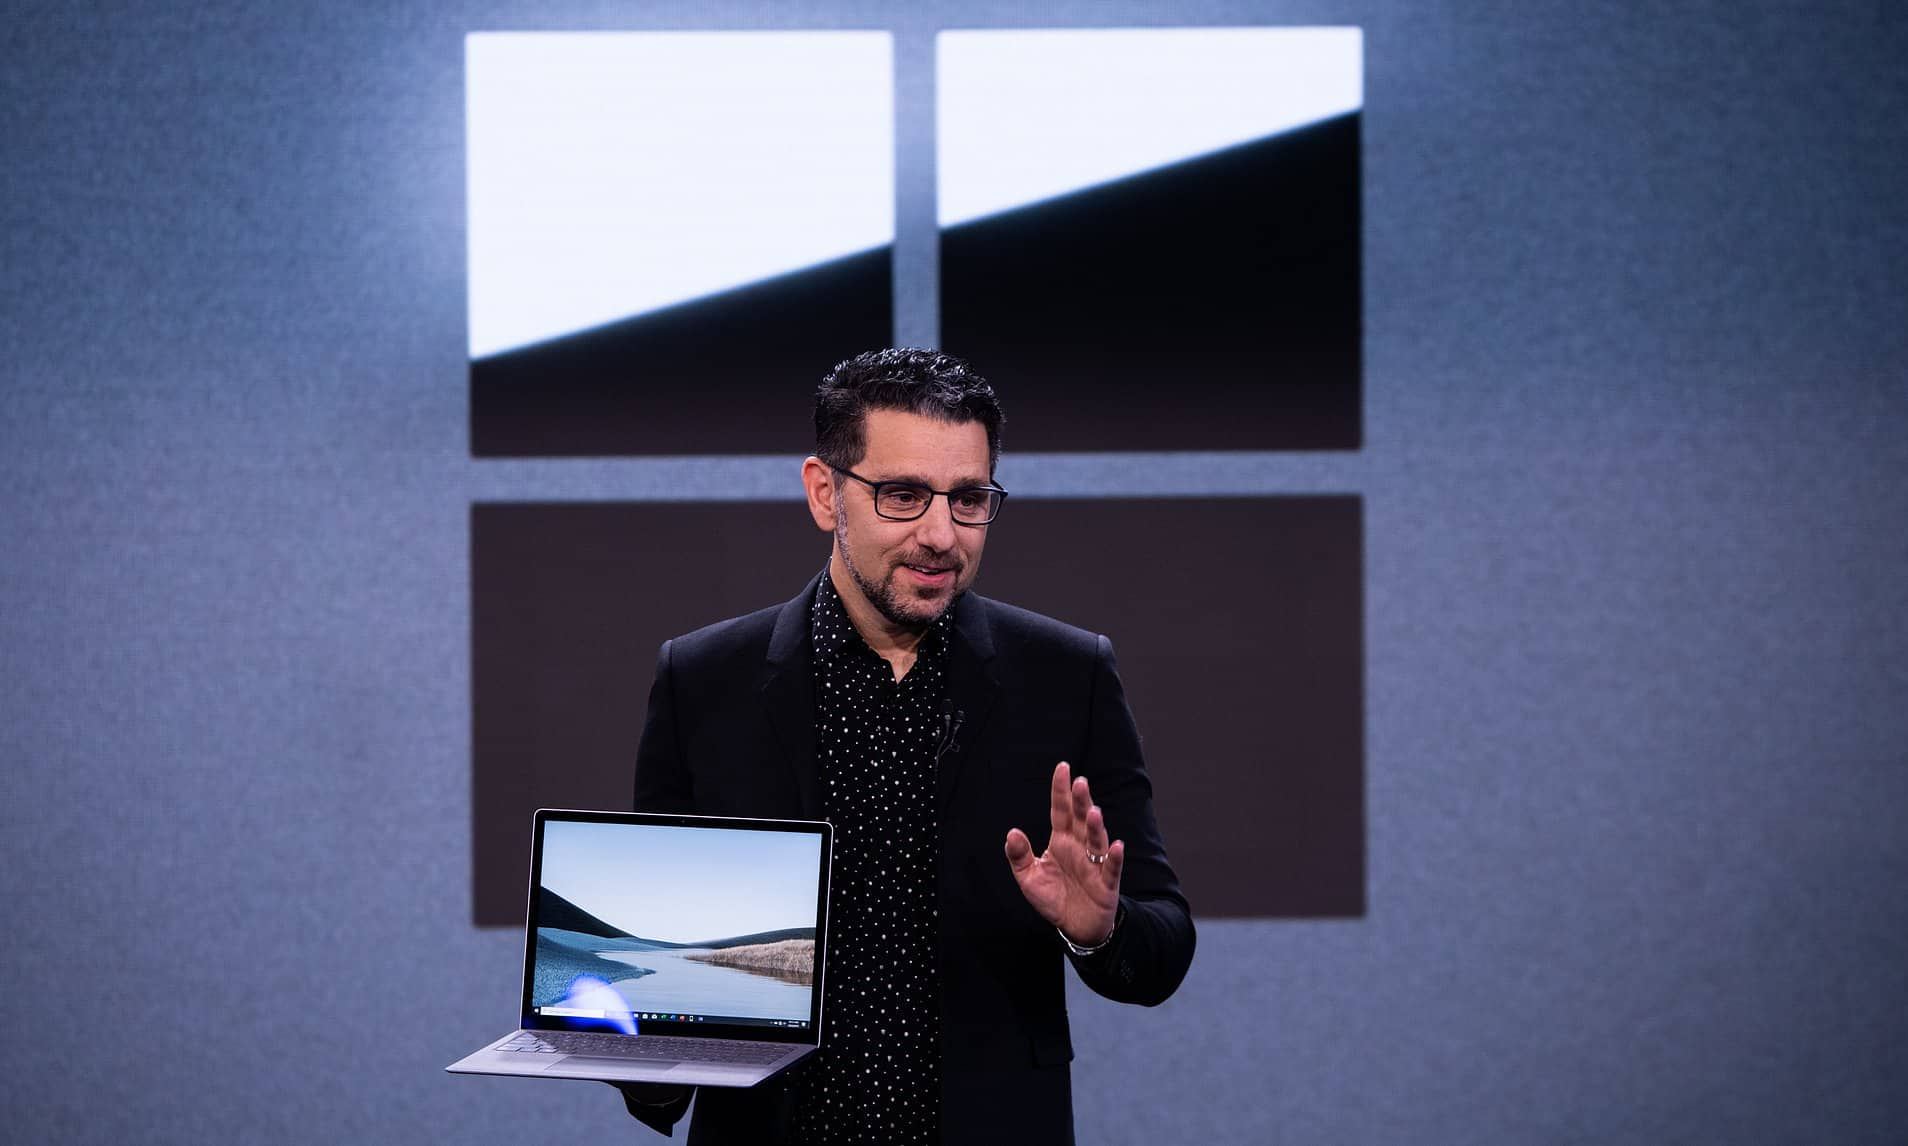 Panos Panay to head Microsoft's Windows and hardware teams